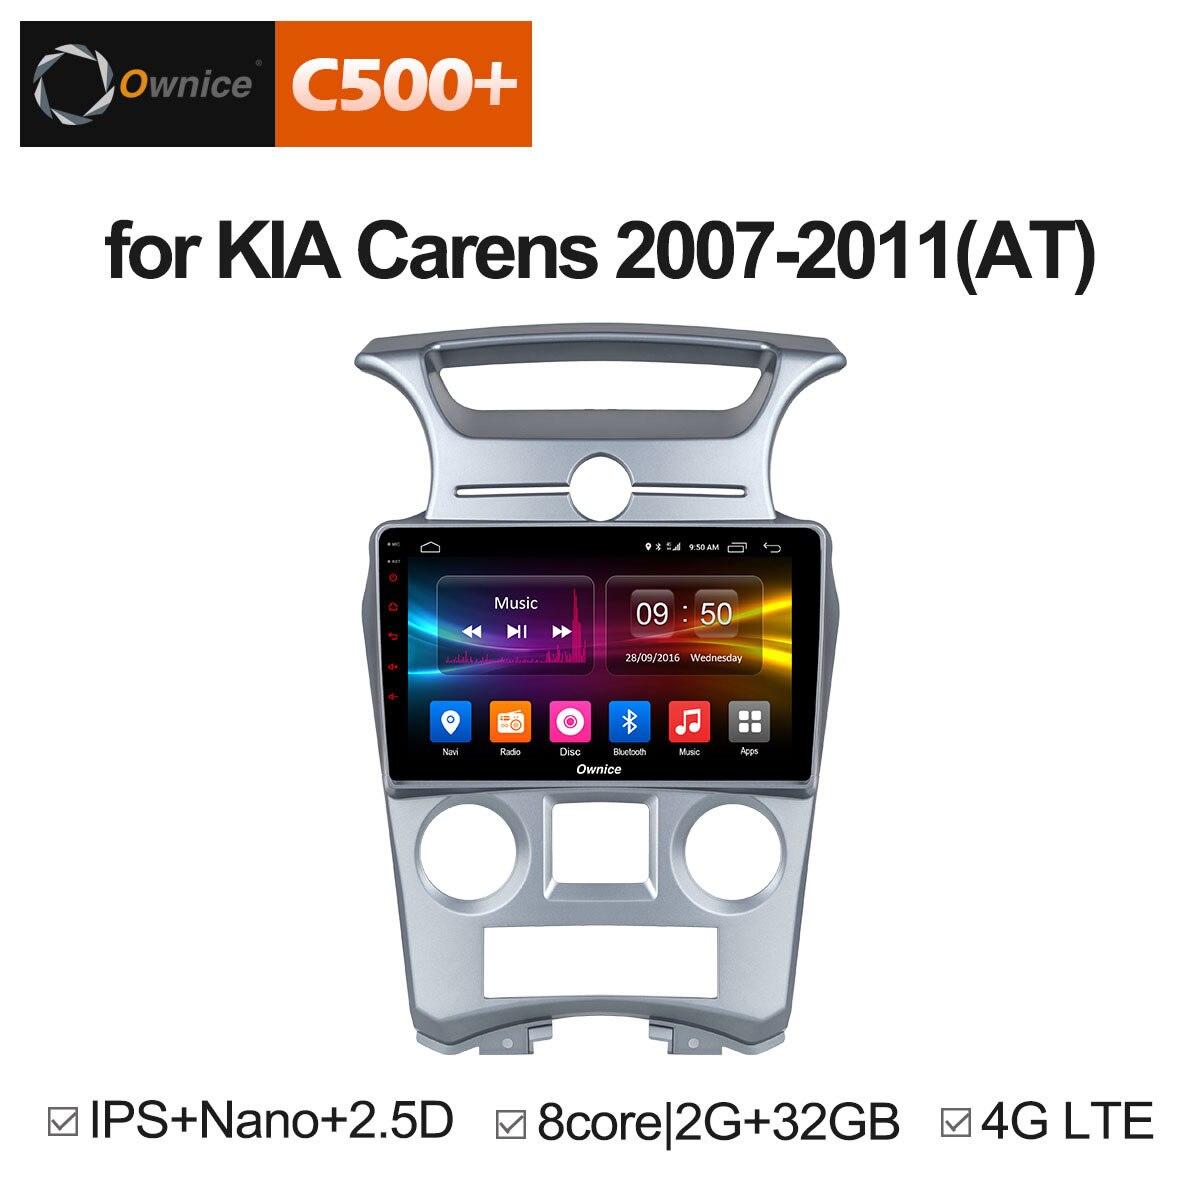 Ownice C500+ G10 Android 8.1 Octa Core 2G RAM 32G ROM Car DVD GPS Player for Kia Carens / Sorento / Sportage / Cerato 2007-2011 ownice c500 4g sim lte octa 8 core android 6 0 for kia ceed 2013 2015 car dvd player gps navi radio wifi 4g bt 2gb ram 32g rom